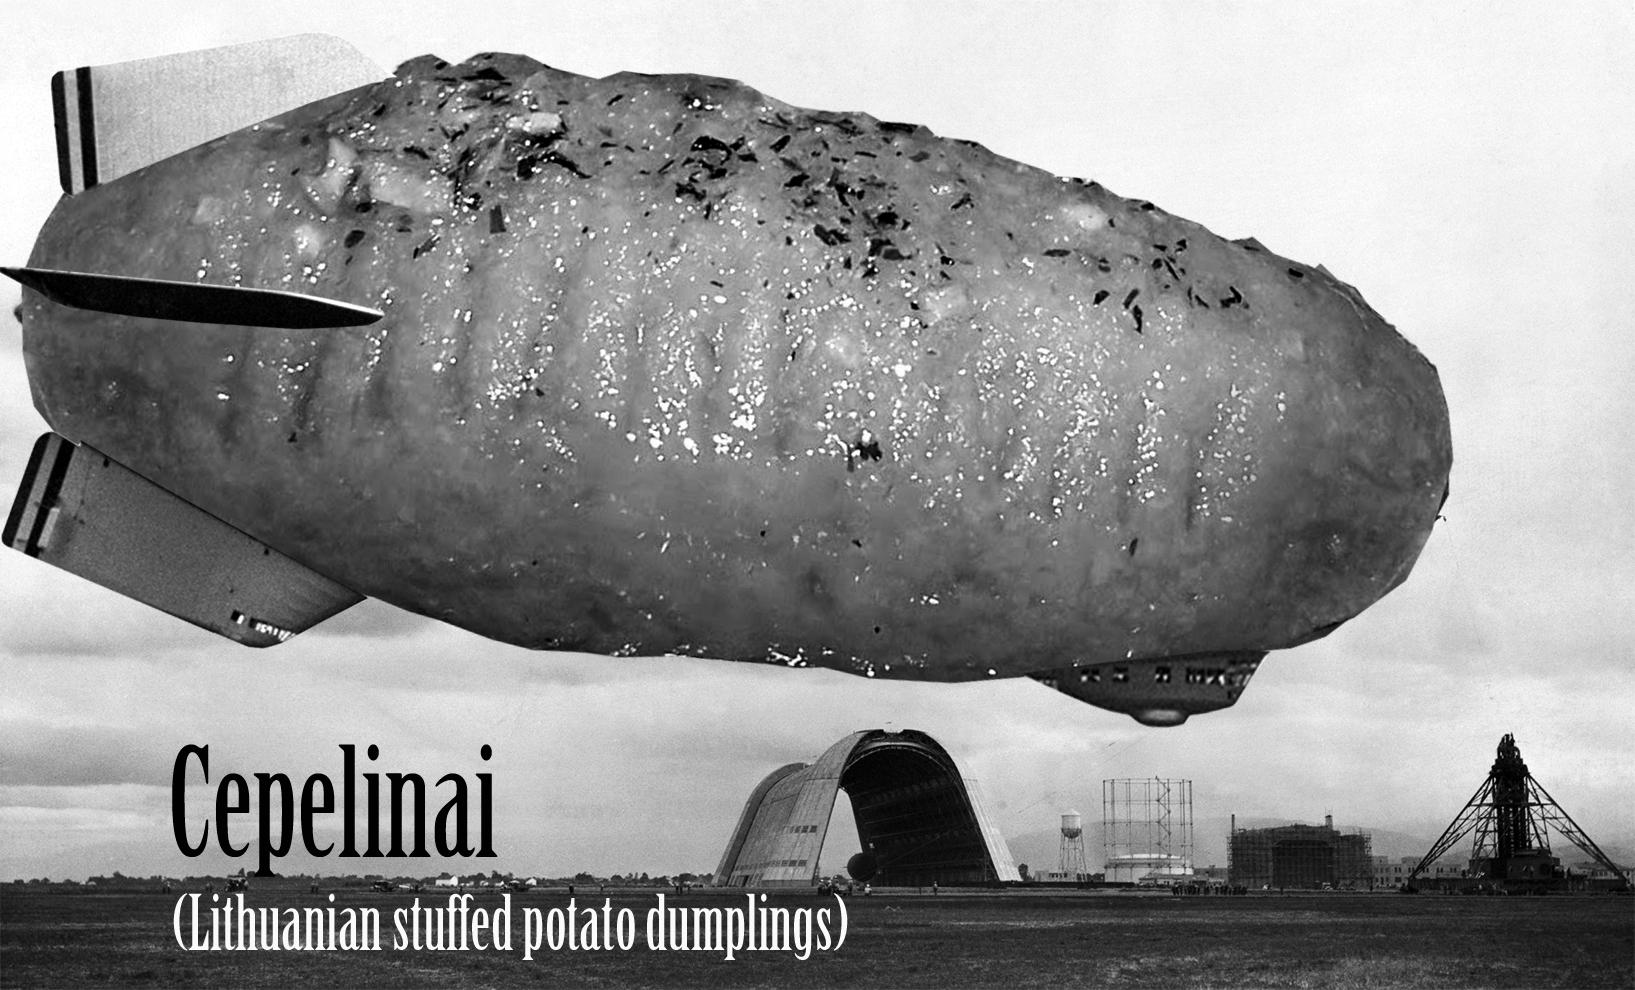 Cepelinai (Lithuanian stuffed potato dumplings)